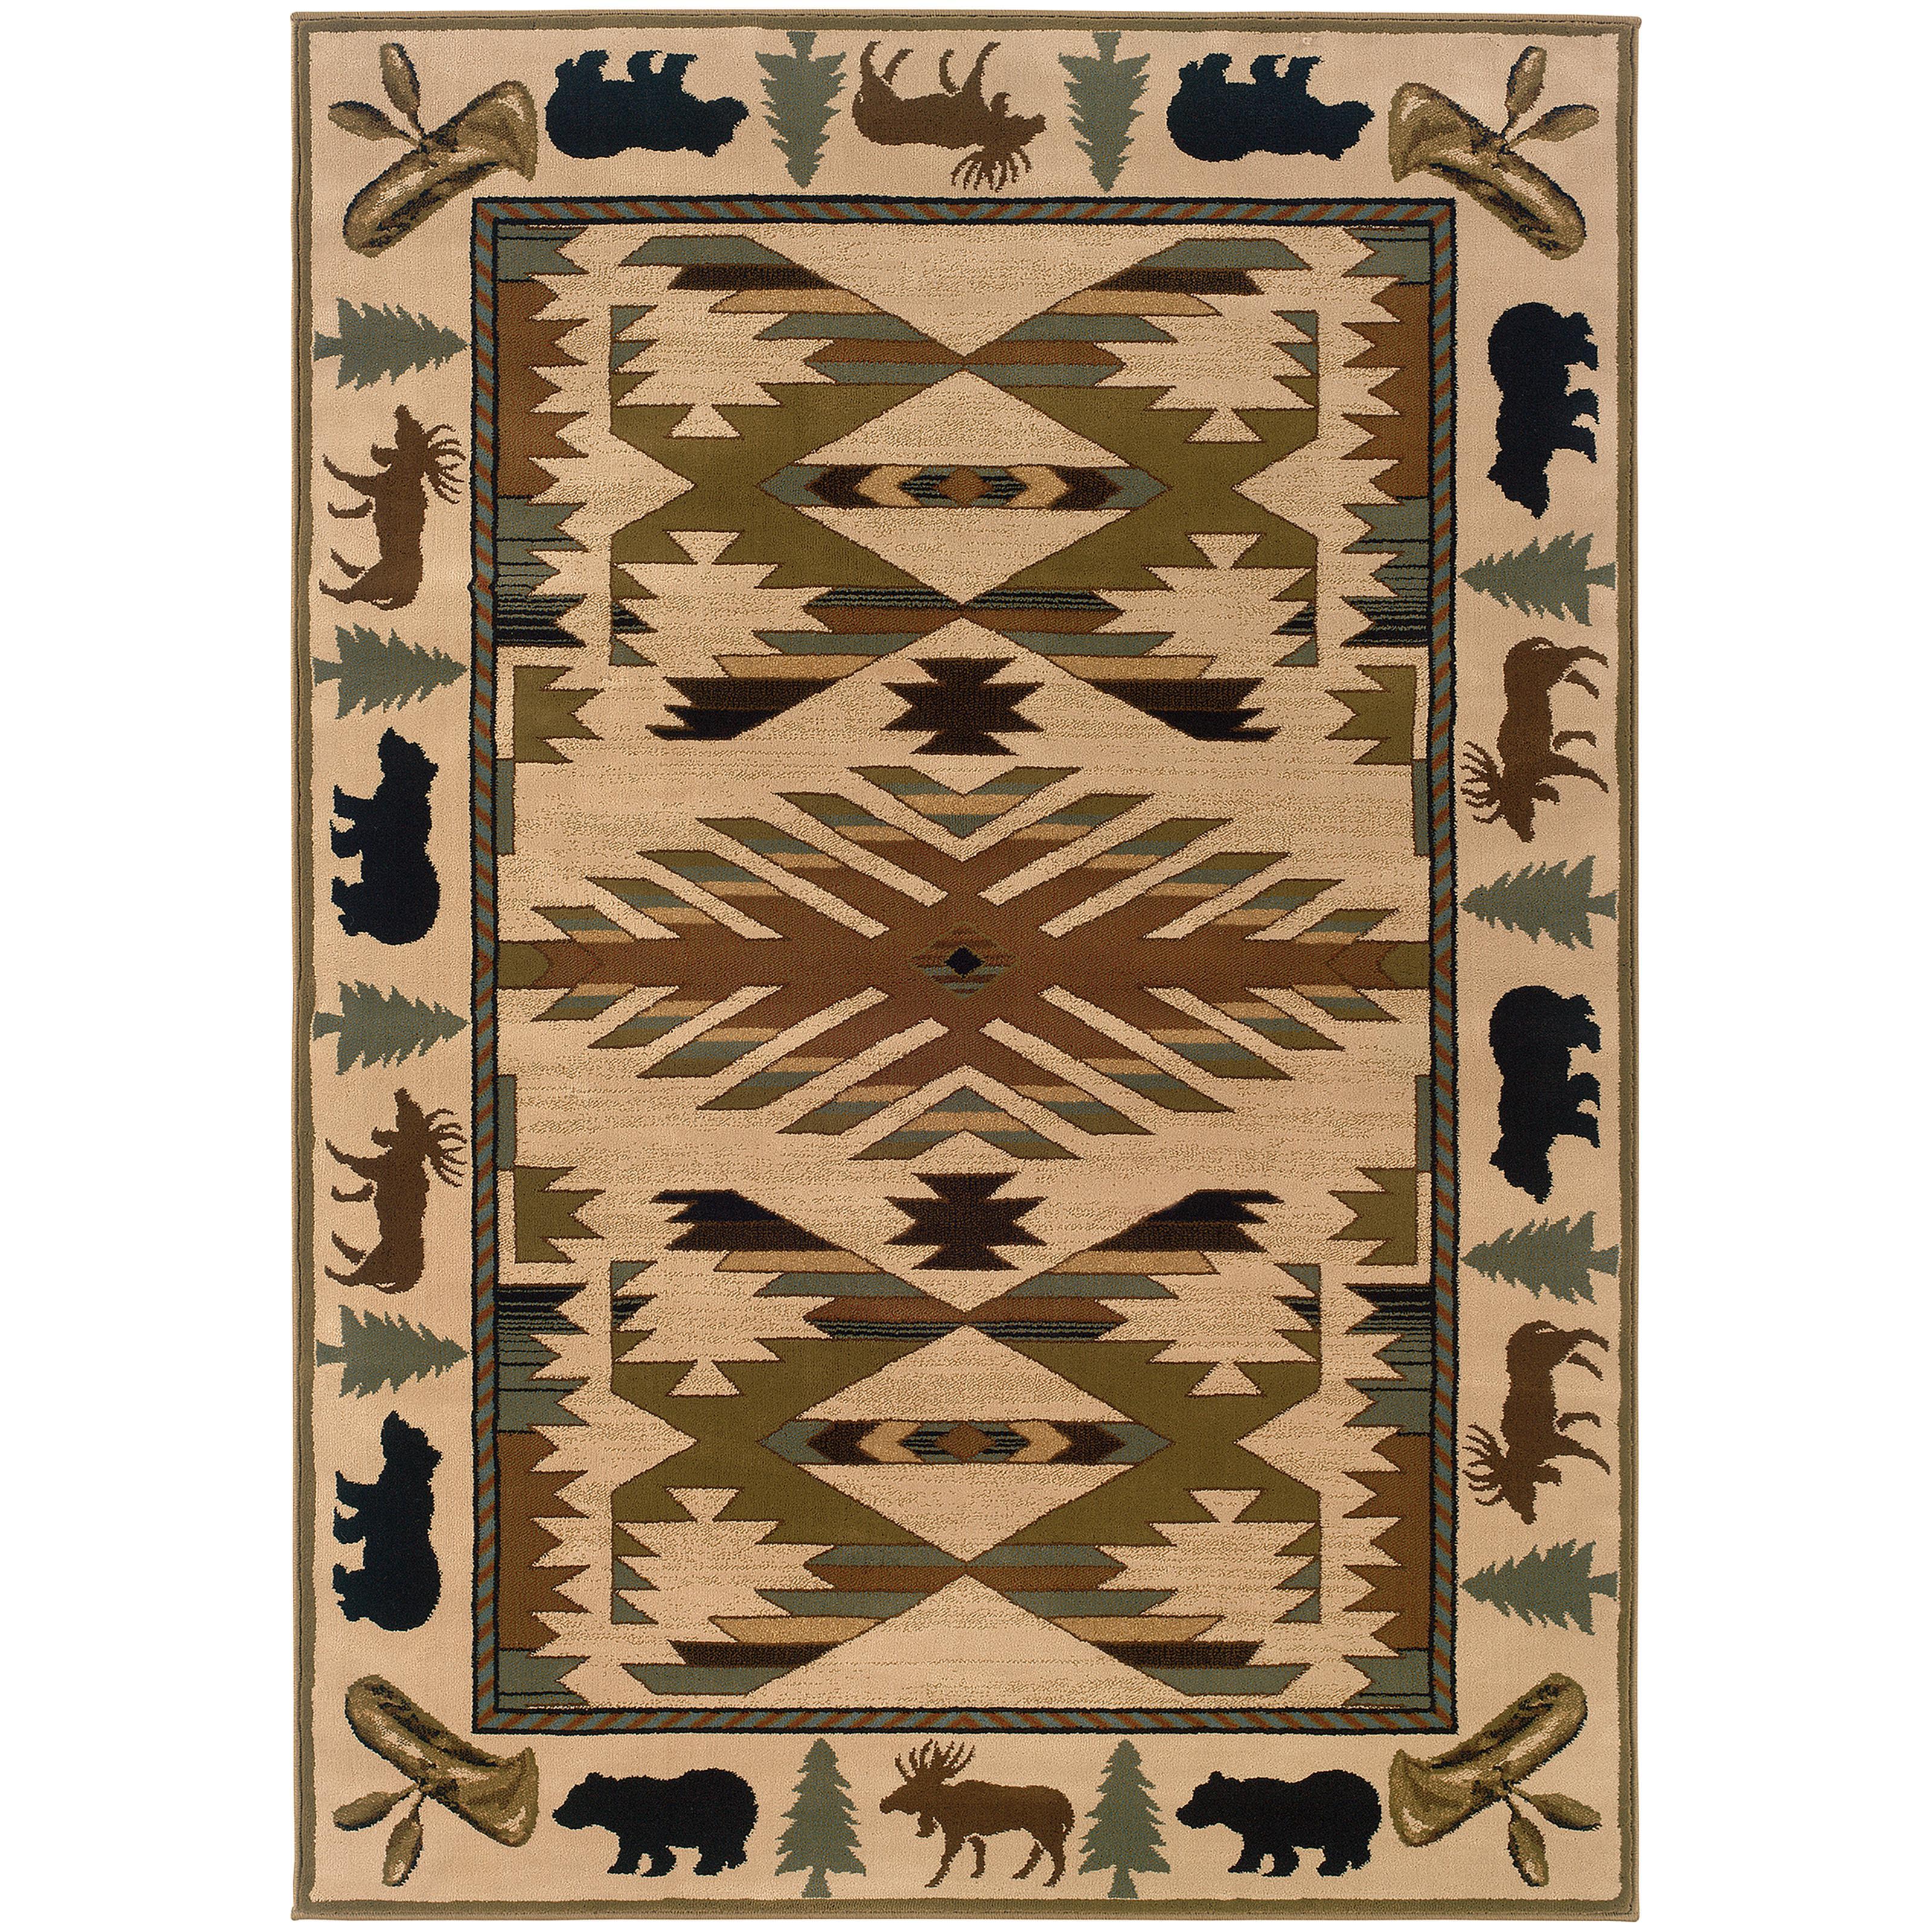 Oriental Weavers Hudson 10' X 13' Rug - Item Number: H1072A305396ST